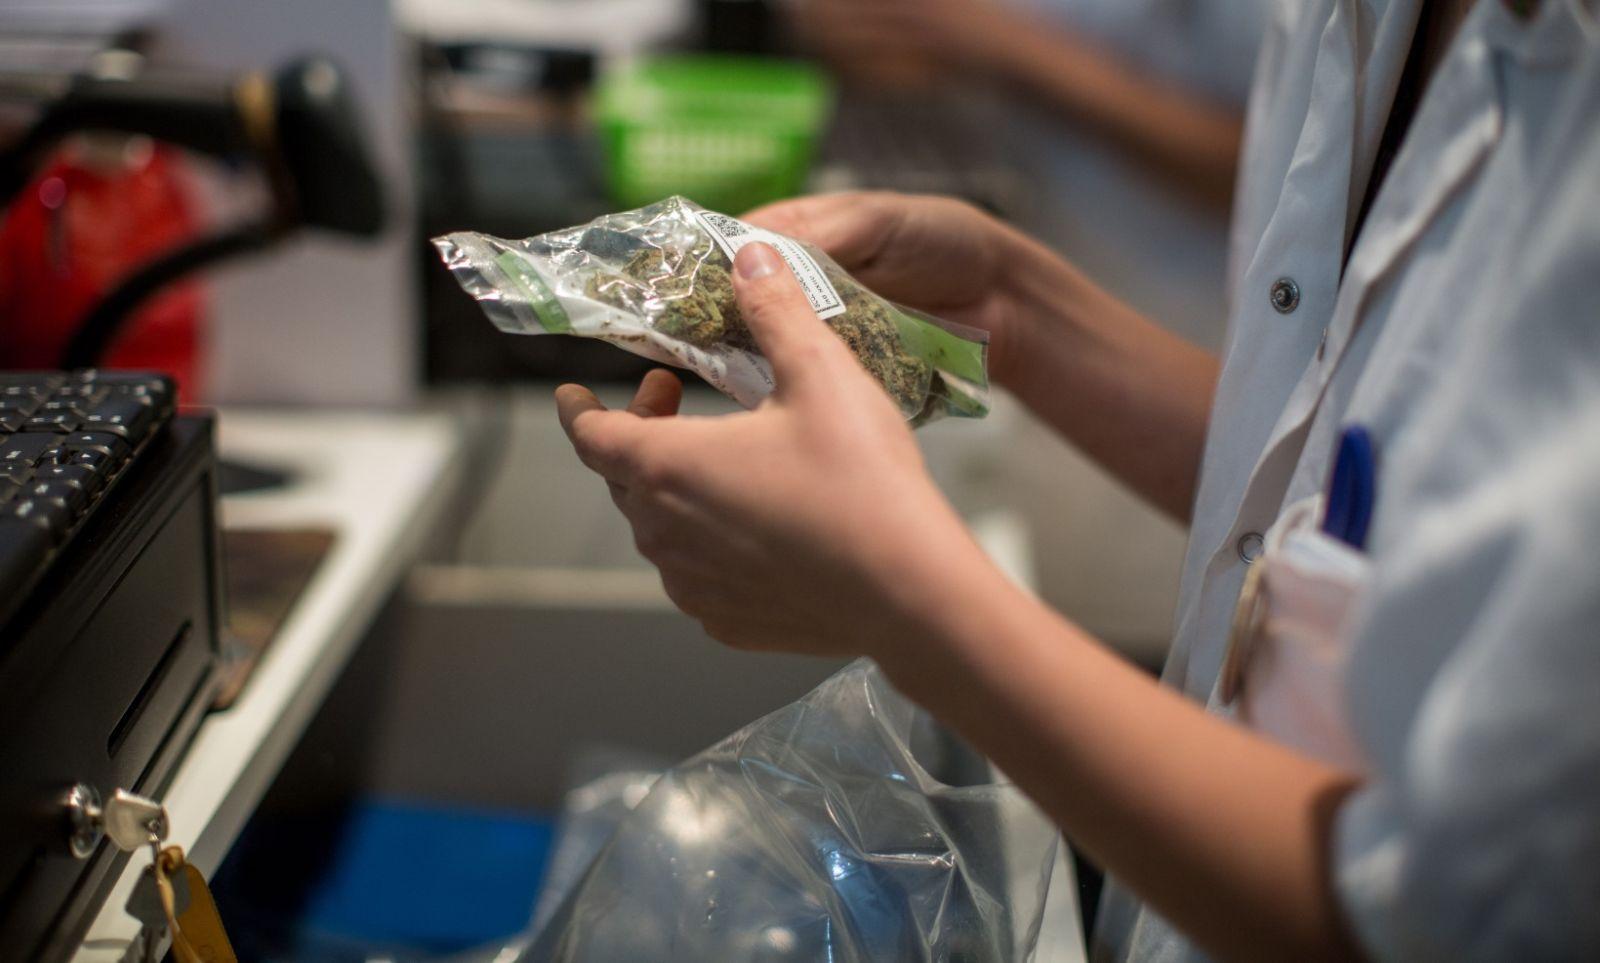 A pharmacist dispensing medical marijuana at the Tikun Olam store in Tel Aviv. Photo by Hadas Parush/FLASH90